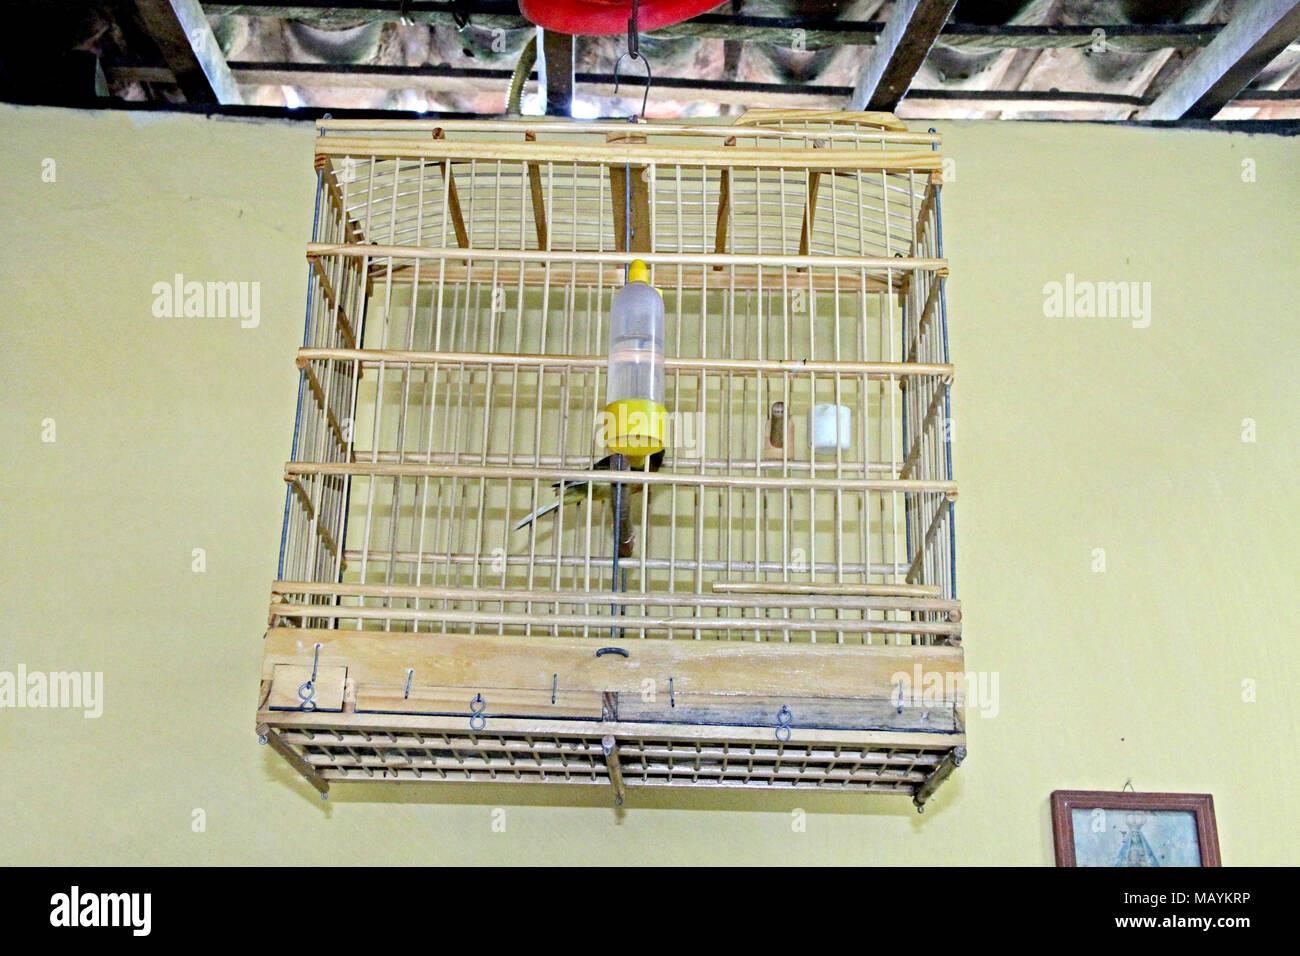 Birdcage Home Interior,Paraiba, Brazil   Stock Image